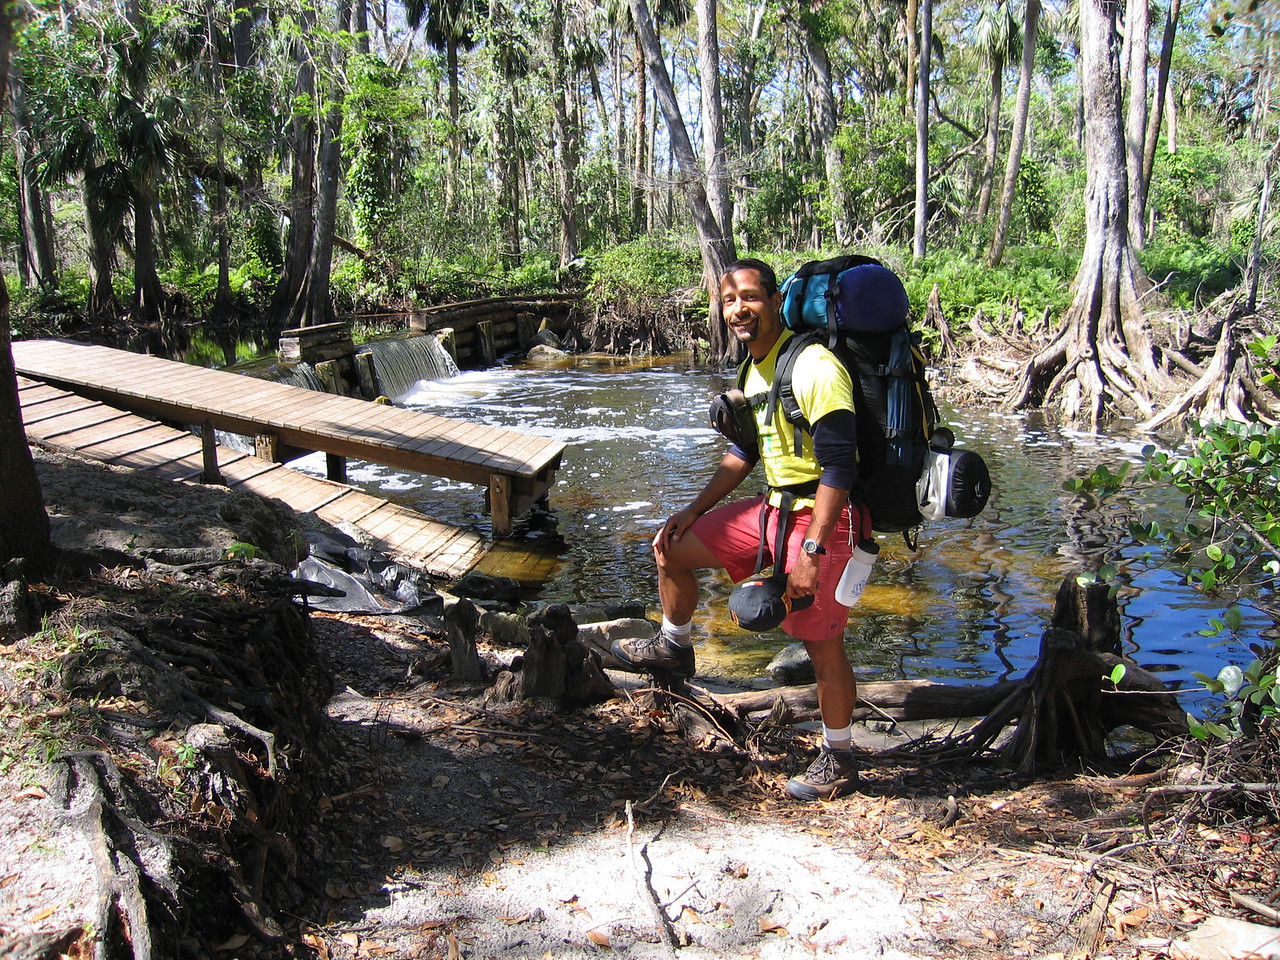 Raphael at the Loxahatchee River<br /> photo credit: Raphael Clemente / Florida Trail Association